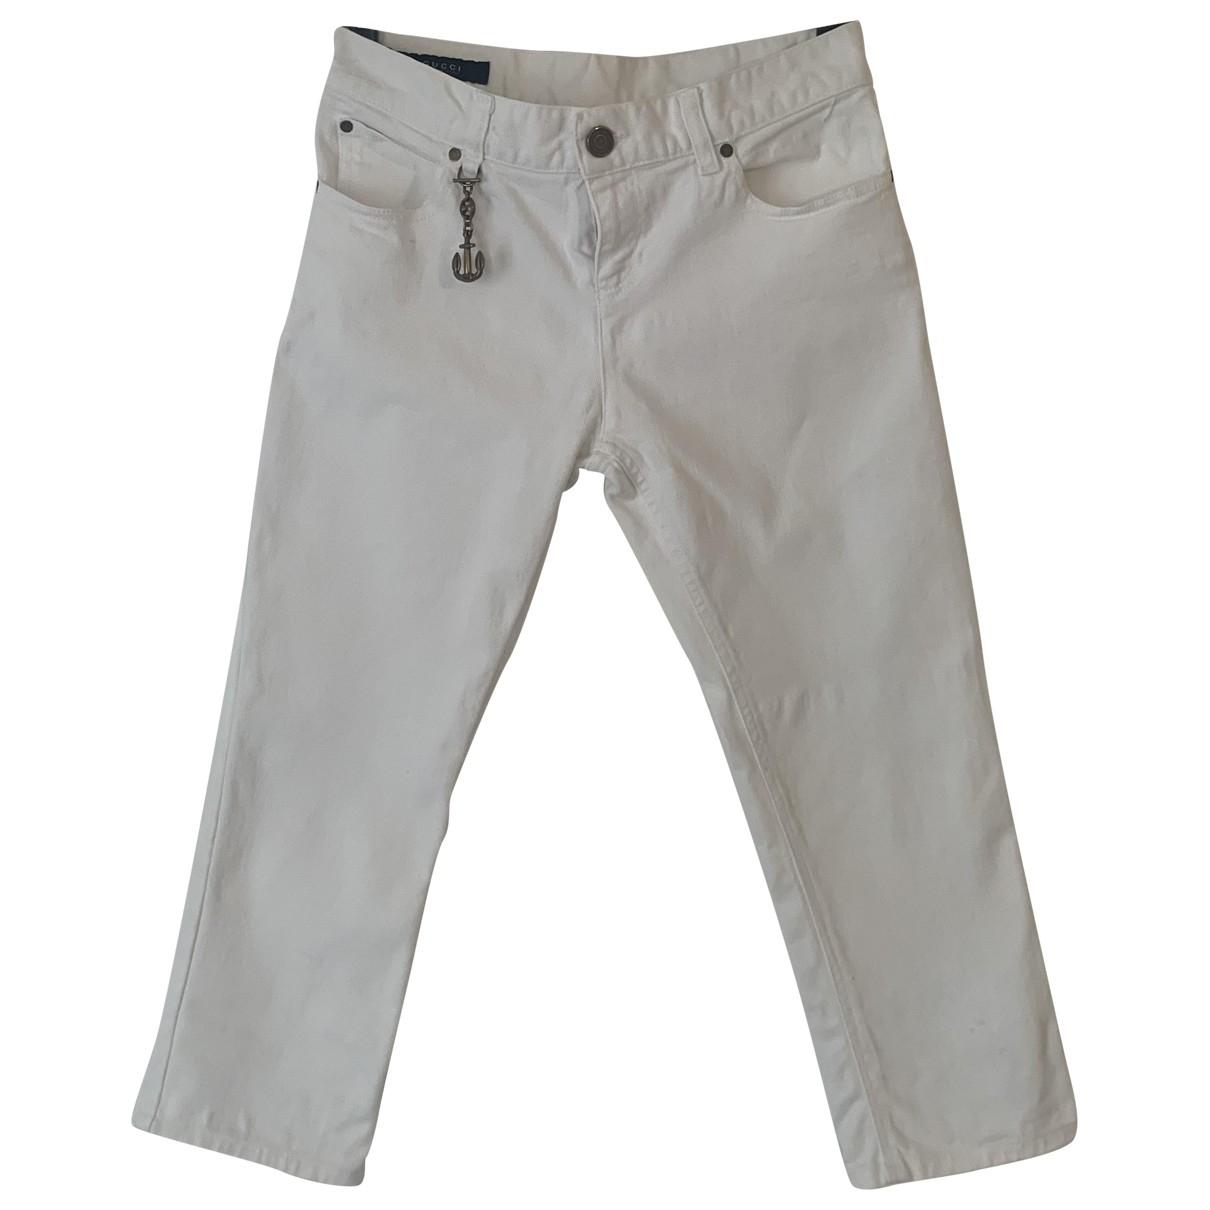 Gucci \N White Cotton - elasthane Jeans for Women 42 FR